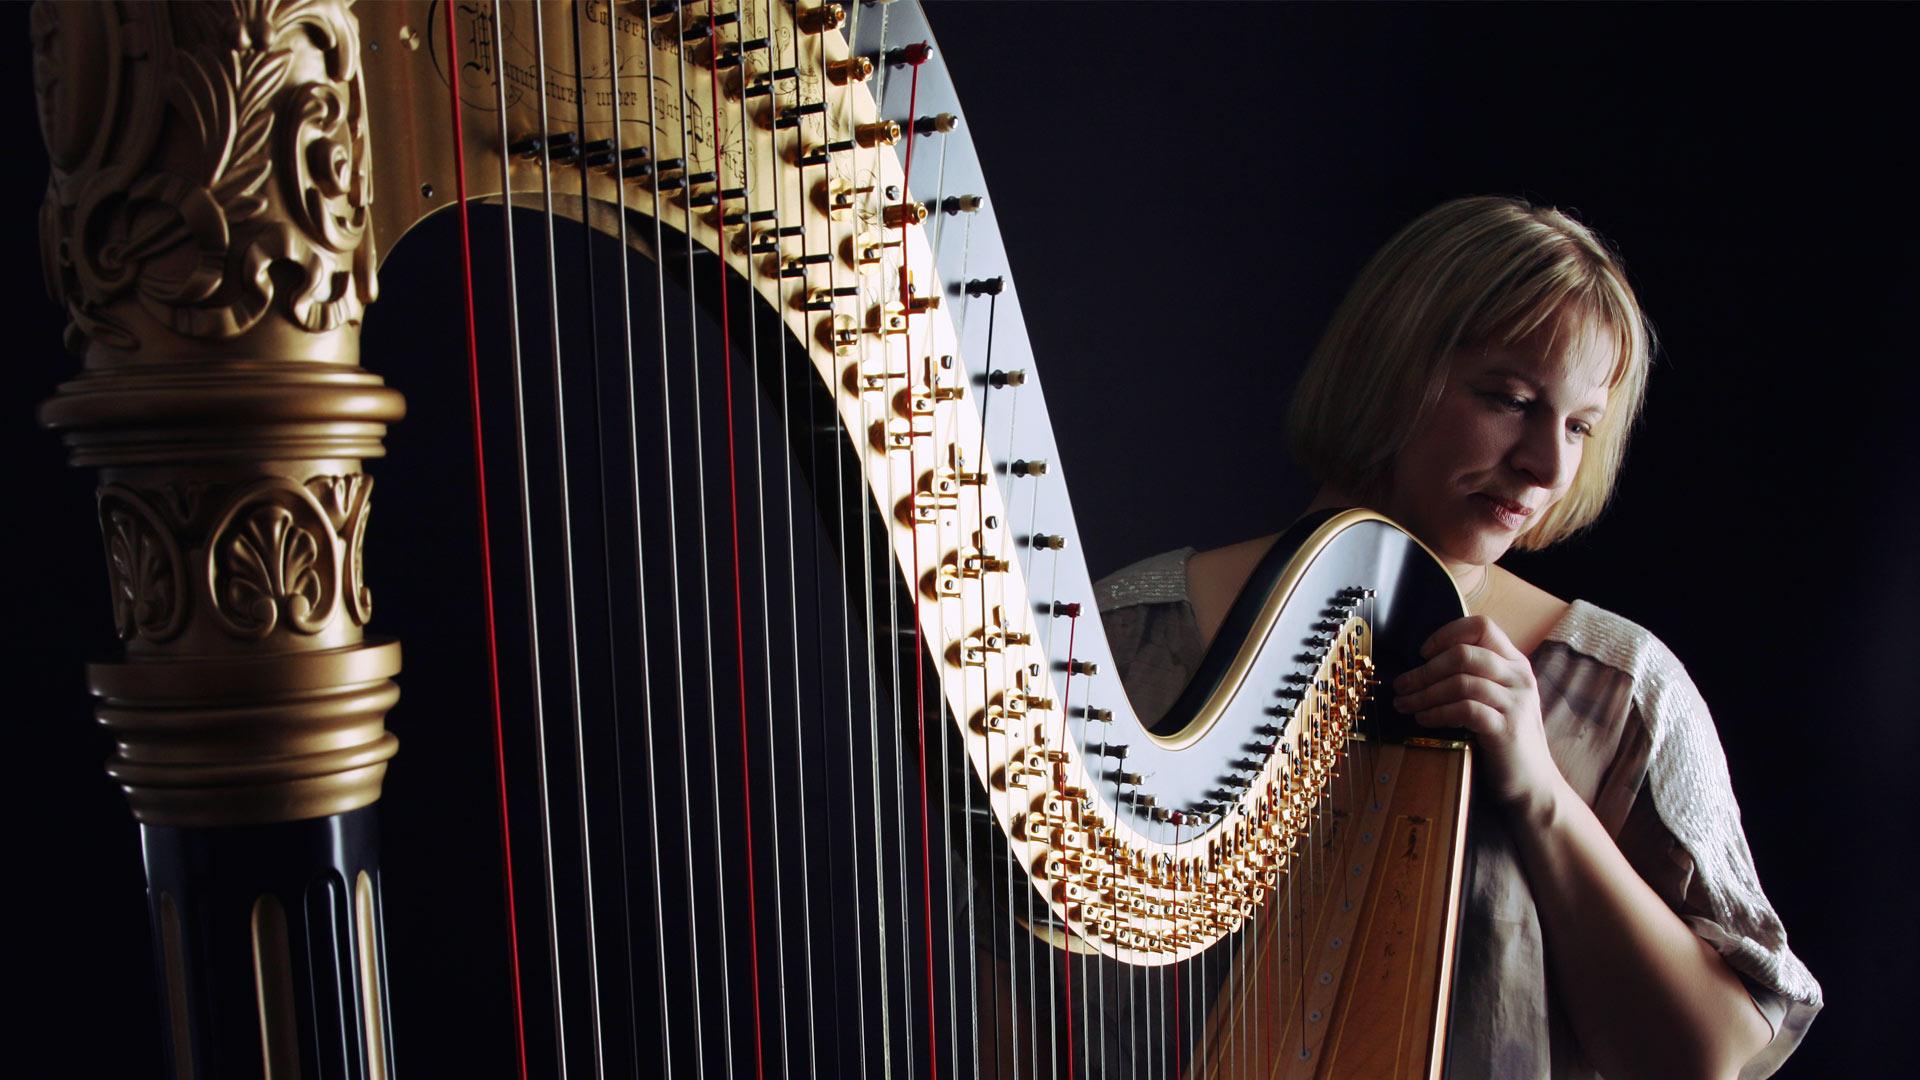 Best 49 Harp Wallpaper on HipWallpaper Sharp Wallpaper Harp 1920x1080